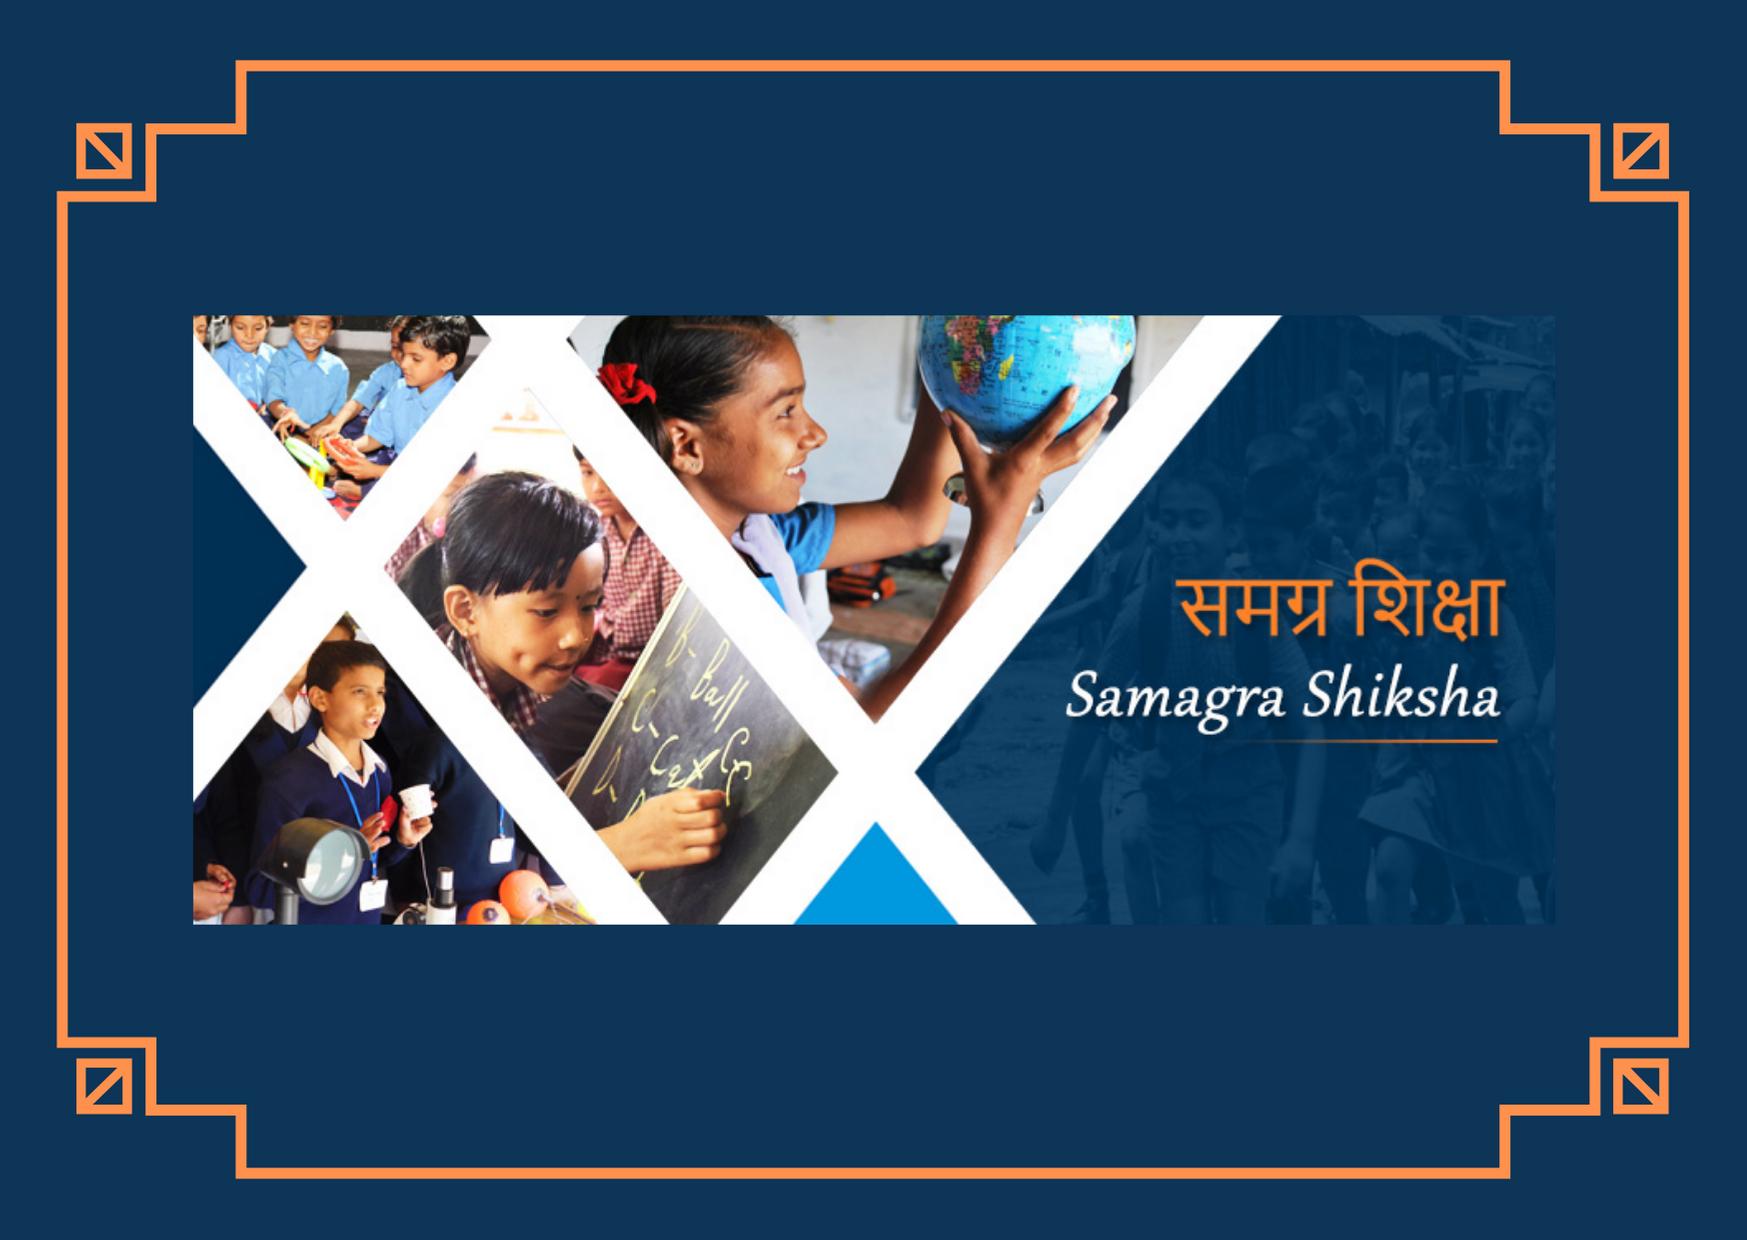 Samagra Shiksha Abhiyan - Integrated Scheme for School Education